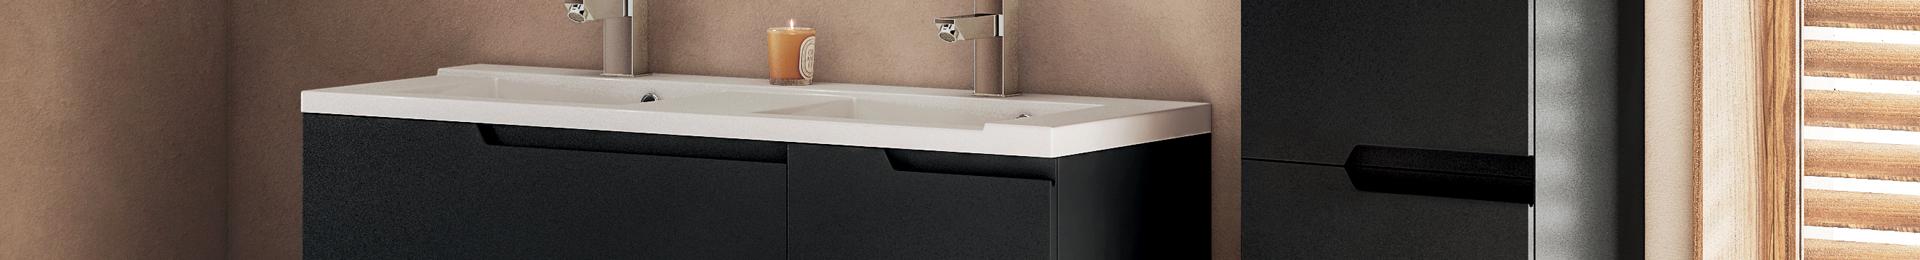 Meuble salle de bain moderne, mobilier, armoires etc | Aquarine